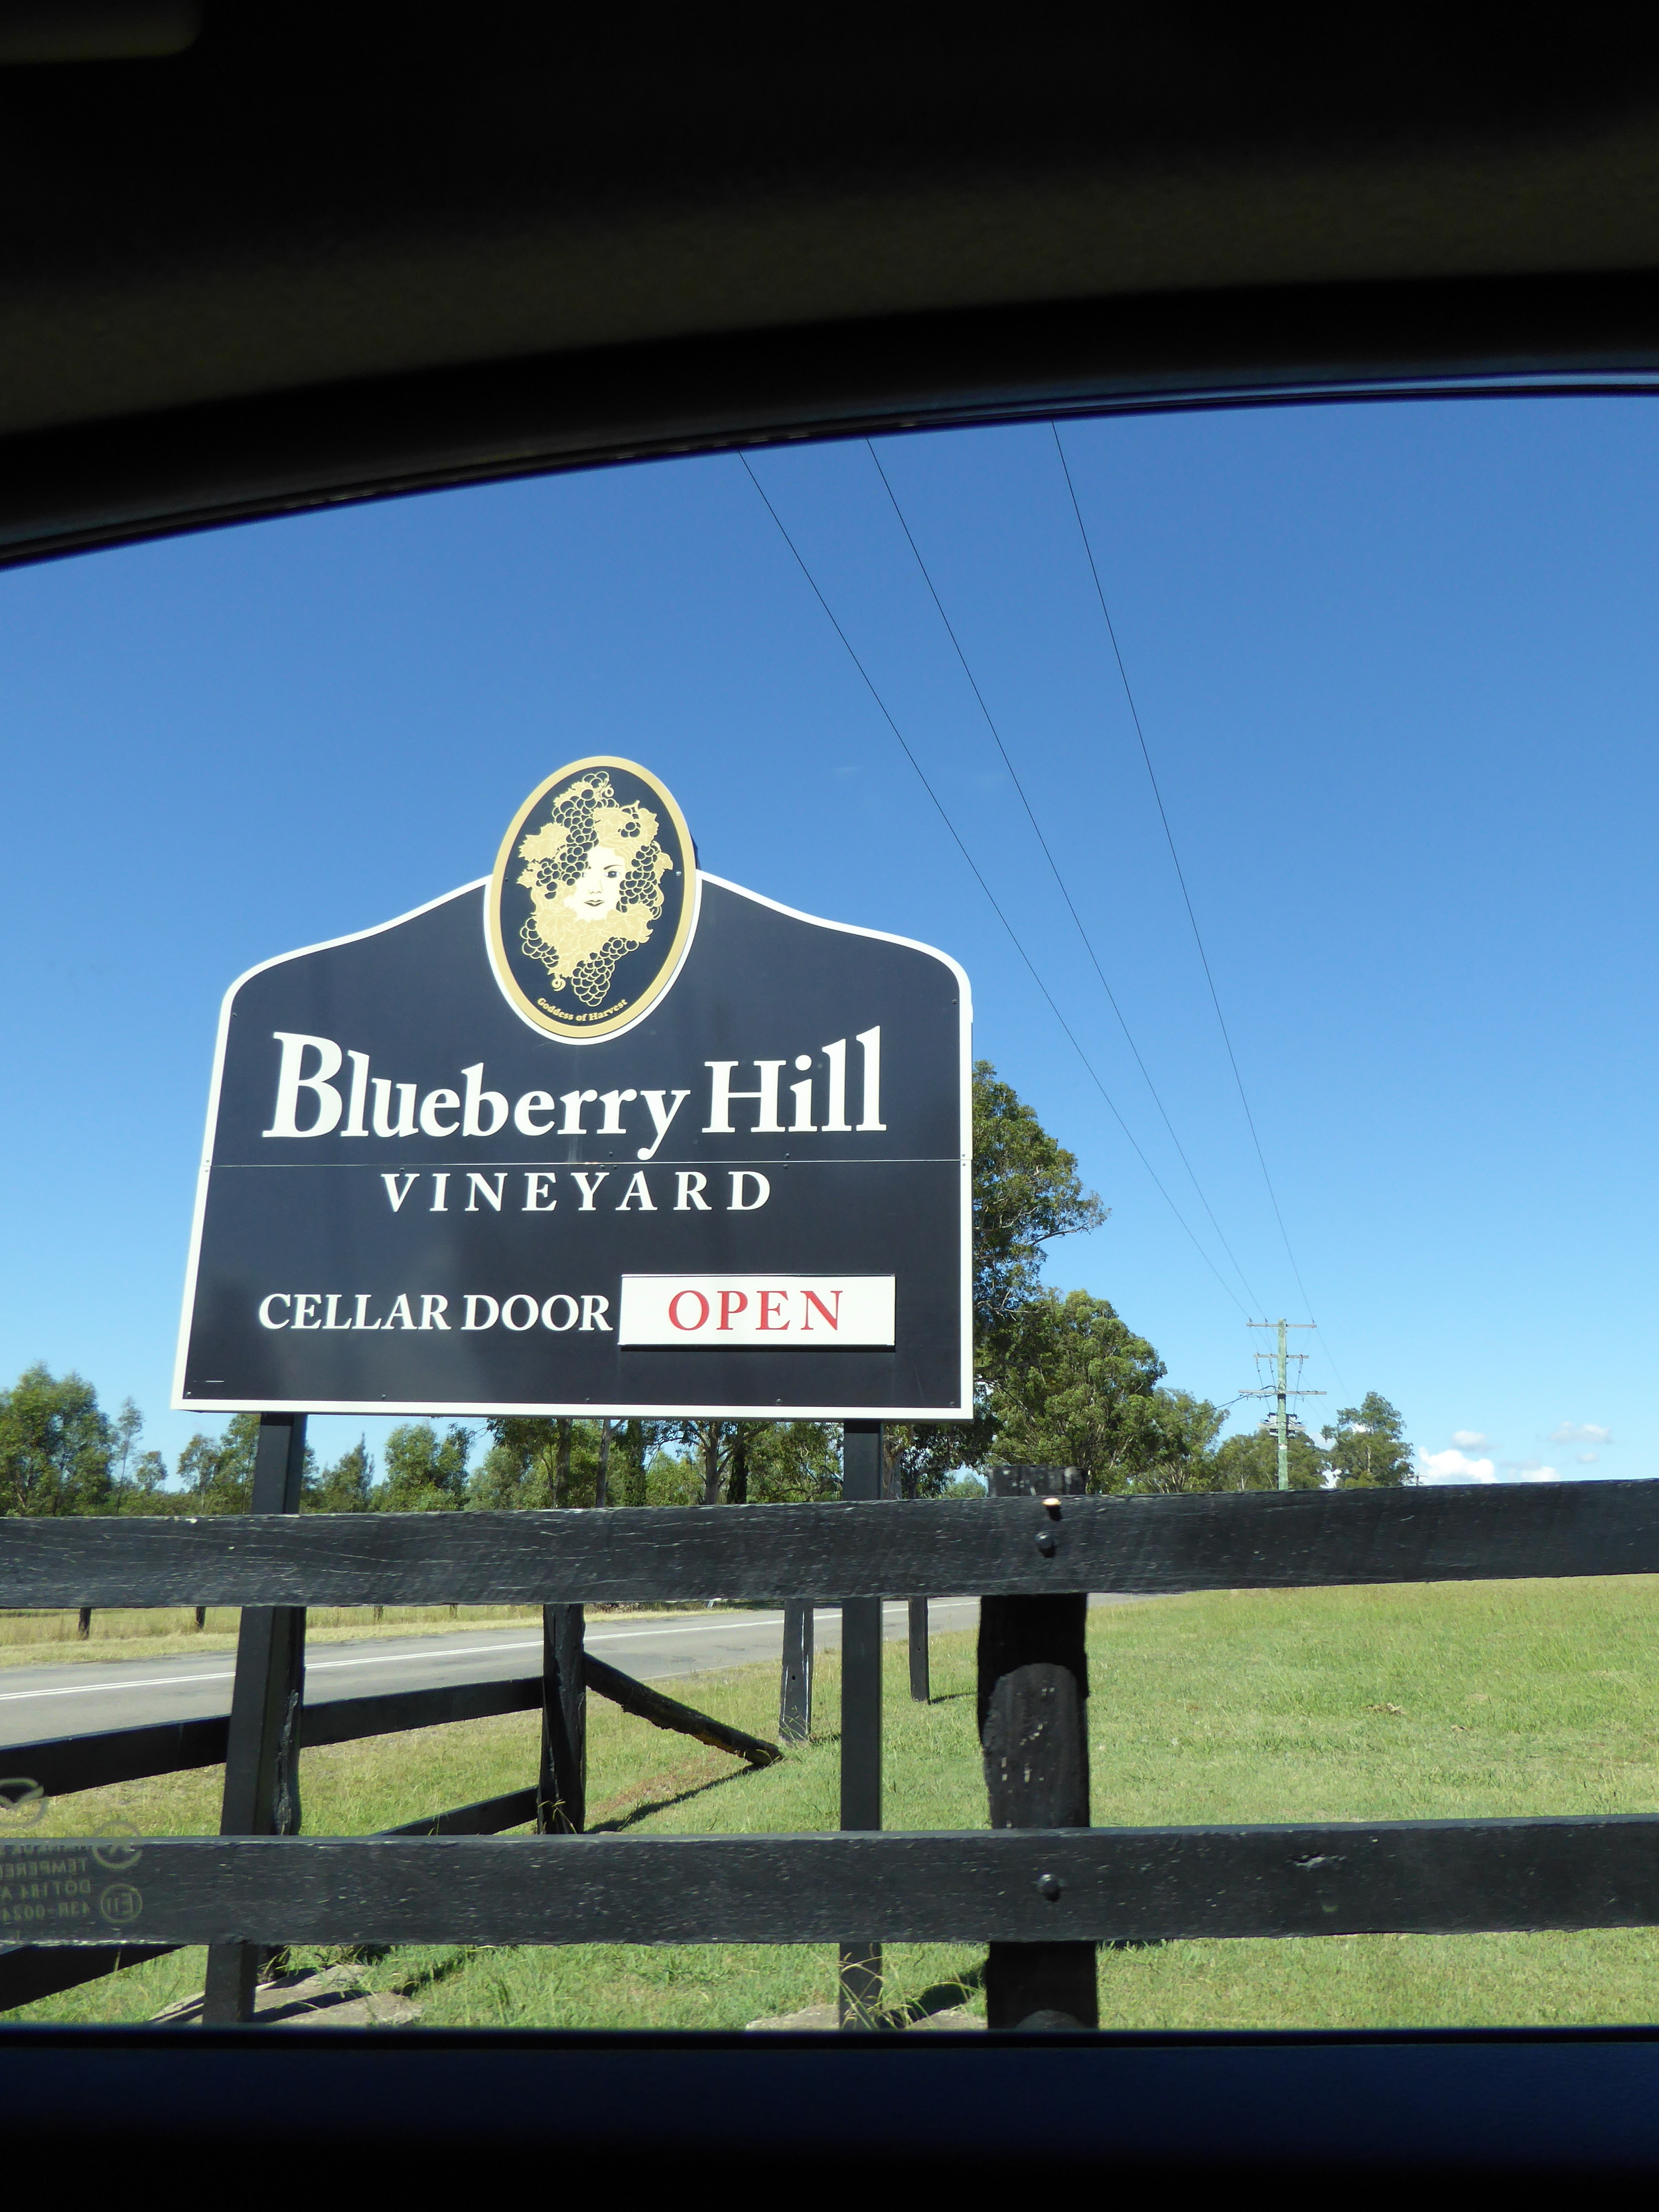 Blueberry Hill Vineyard